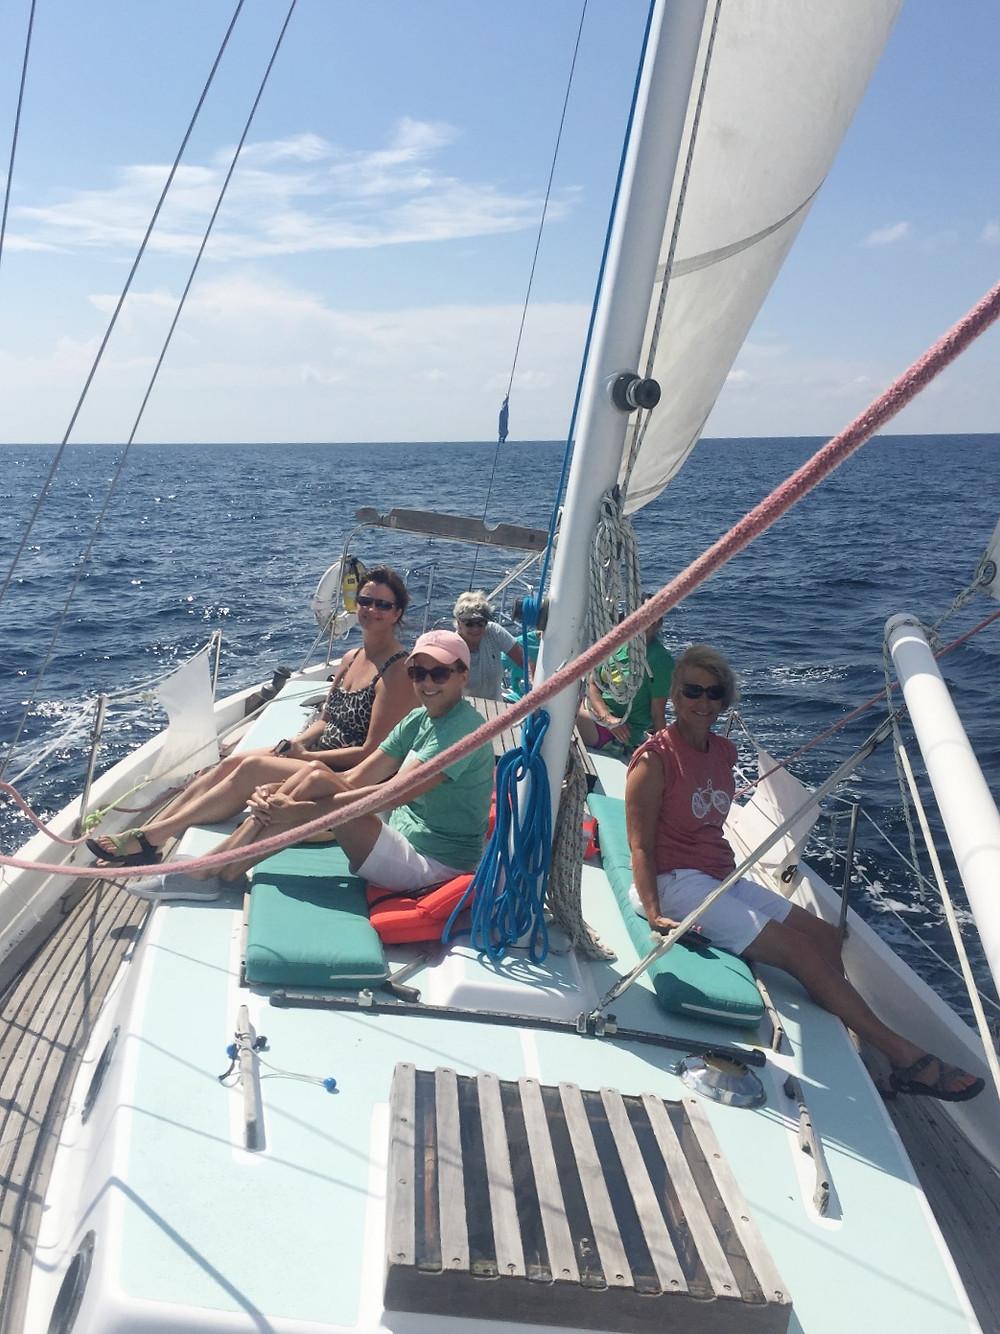 fall break, Destin florida,  sailing, sailboat, private sailing cruise, fair winds sailing co